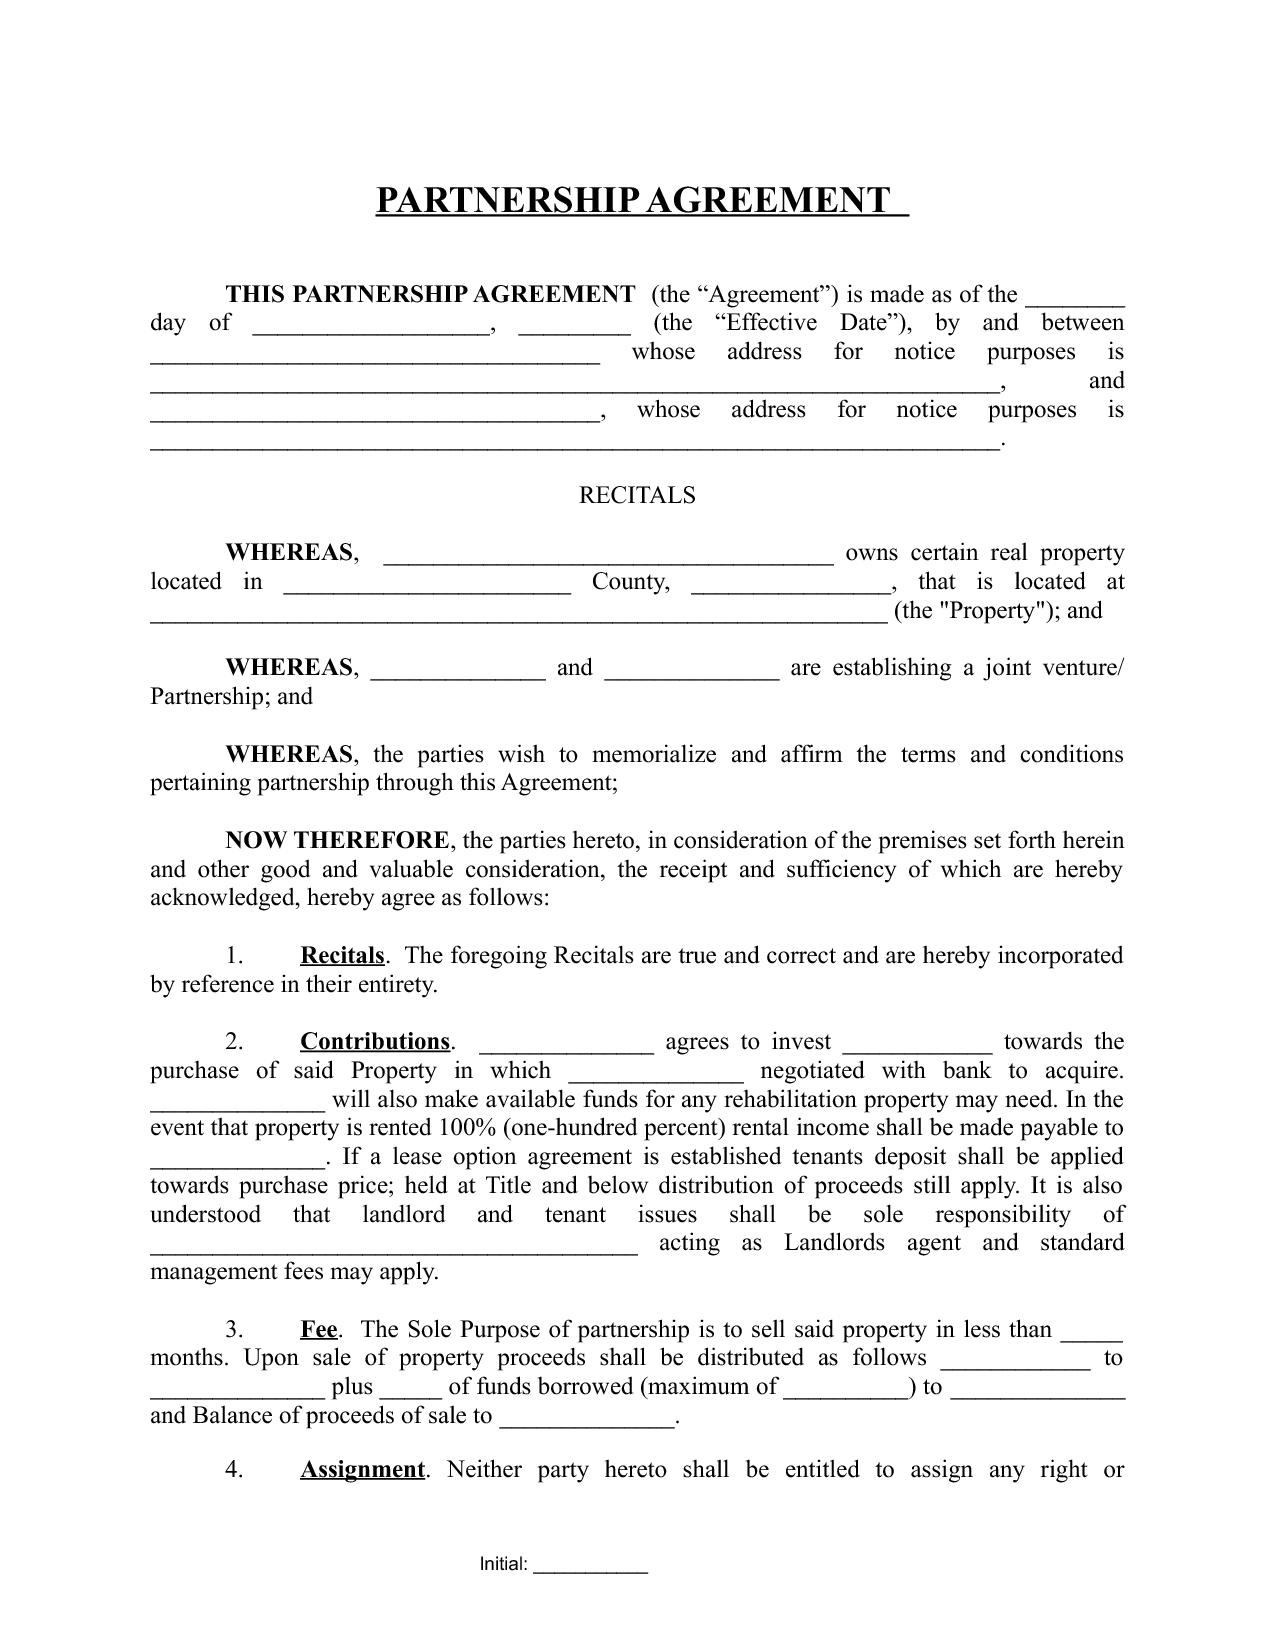 Partnership Agreement 0